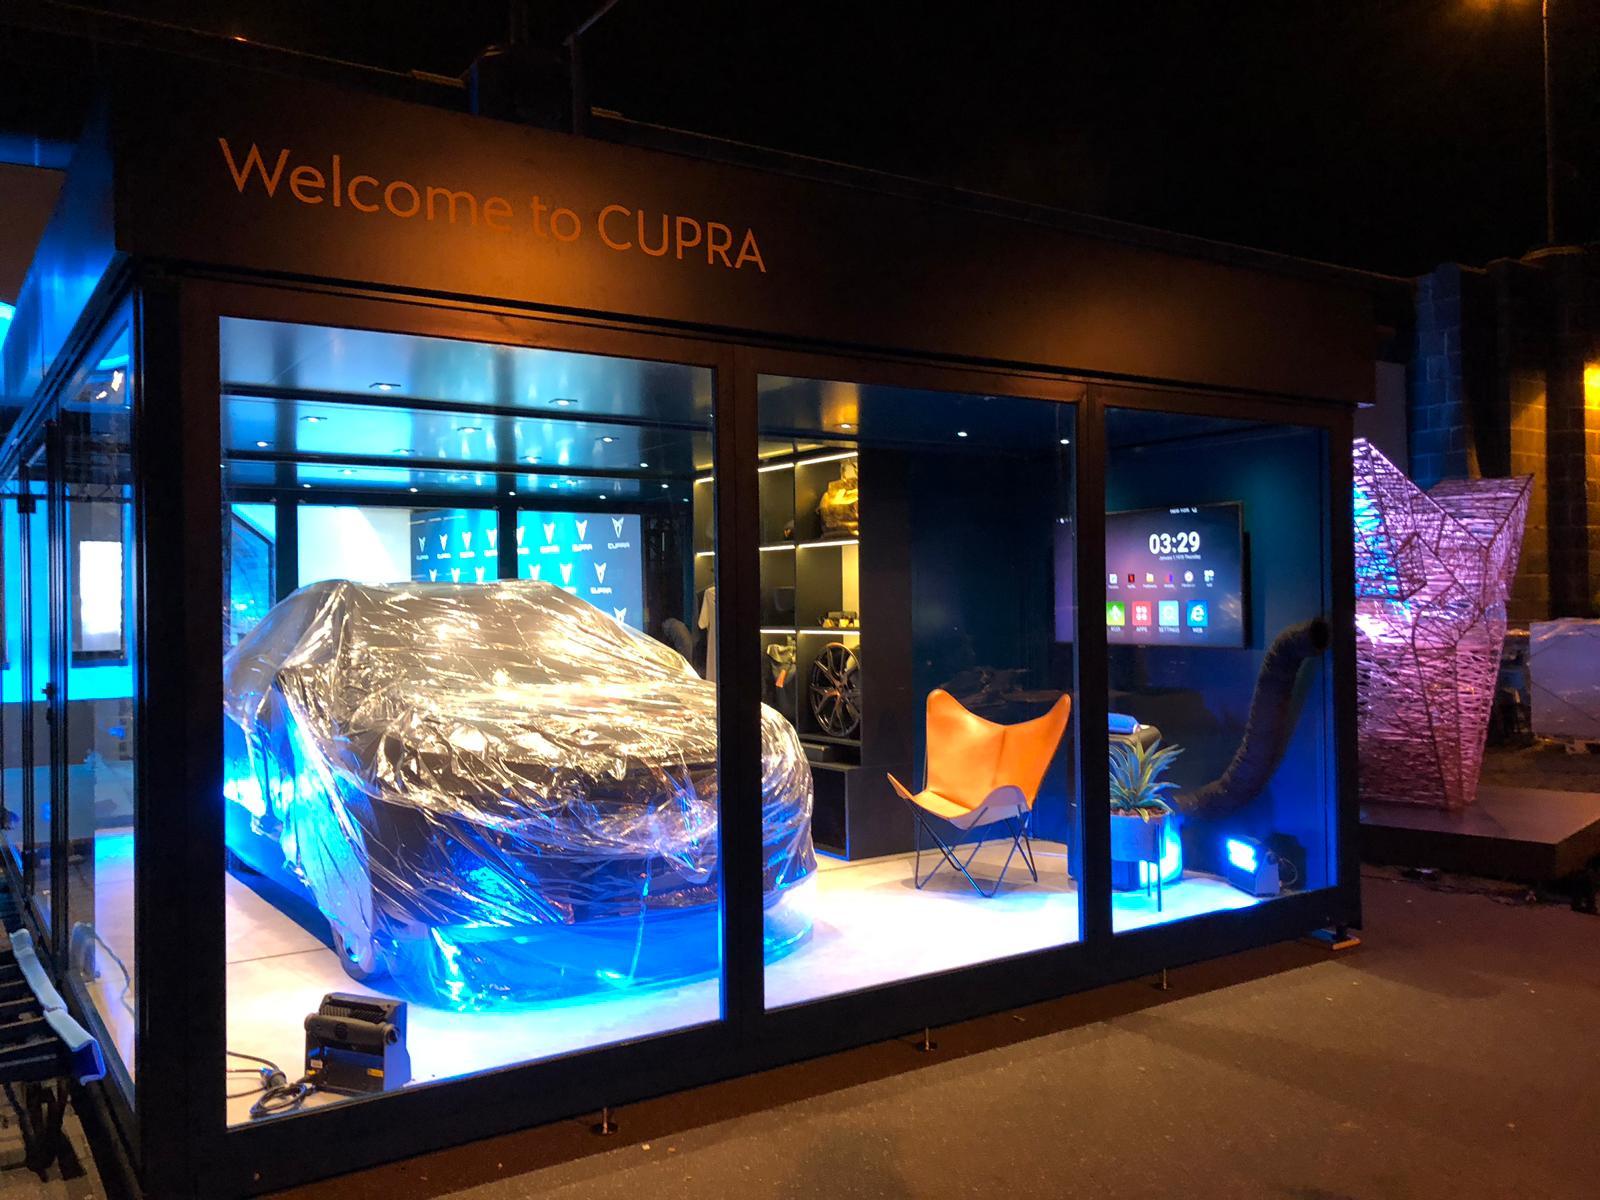 Cupra Night 2019 - Modell: HighFive